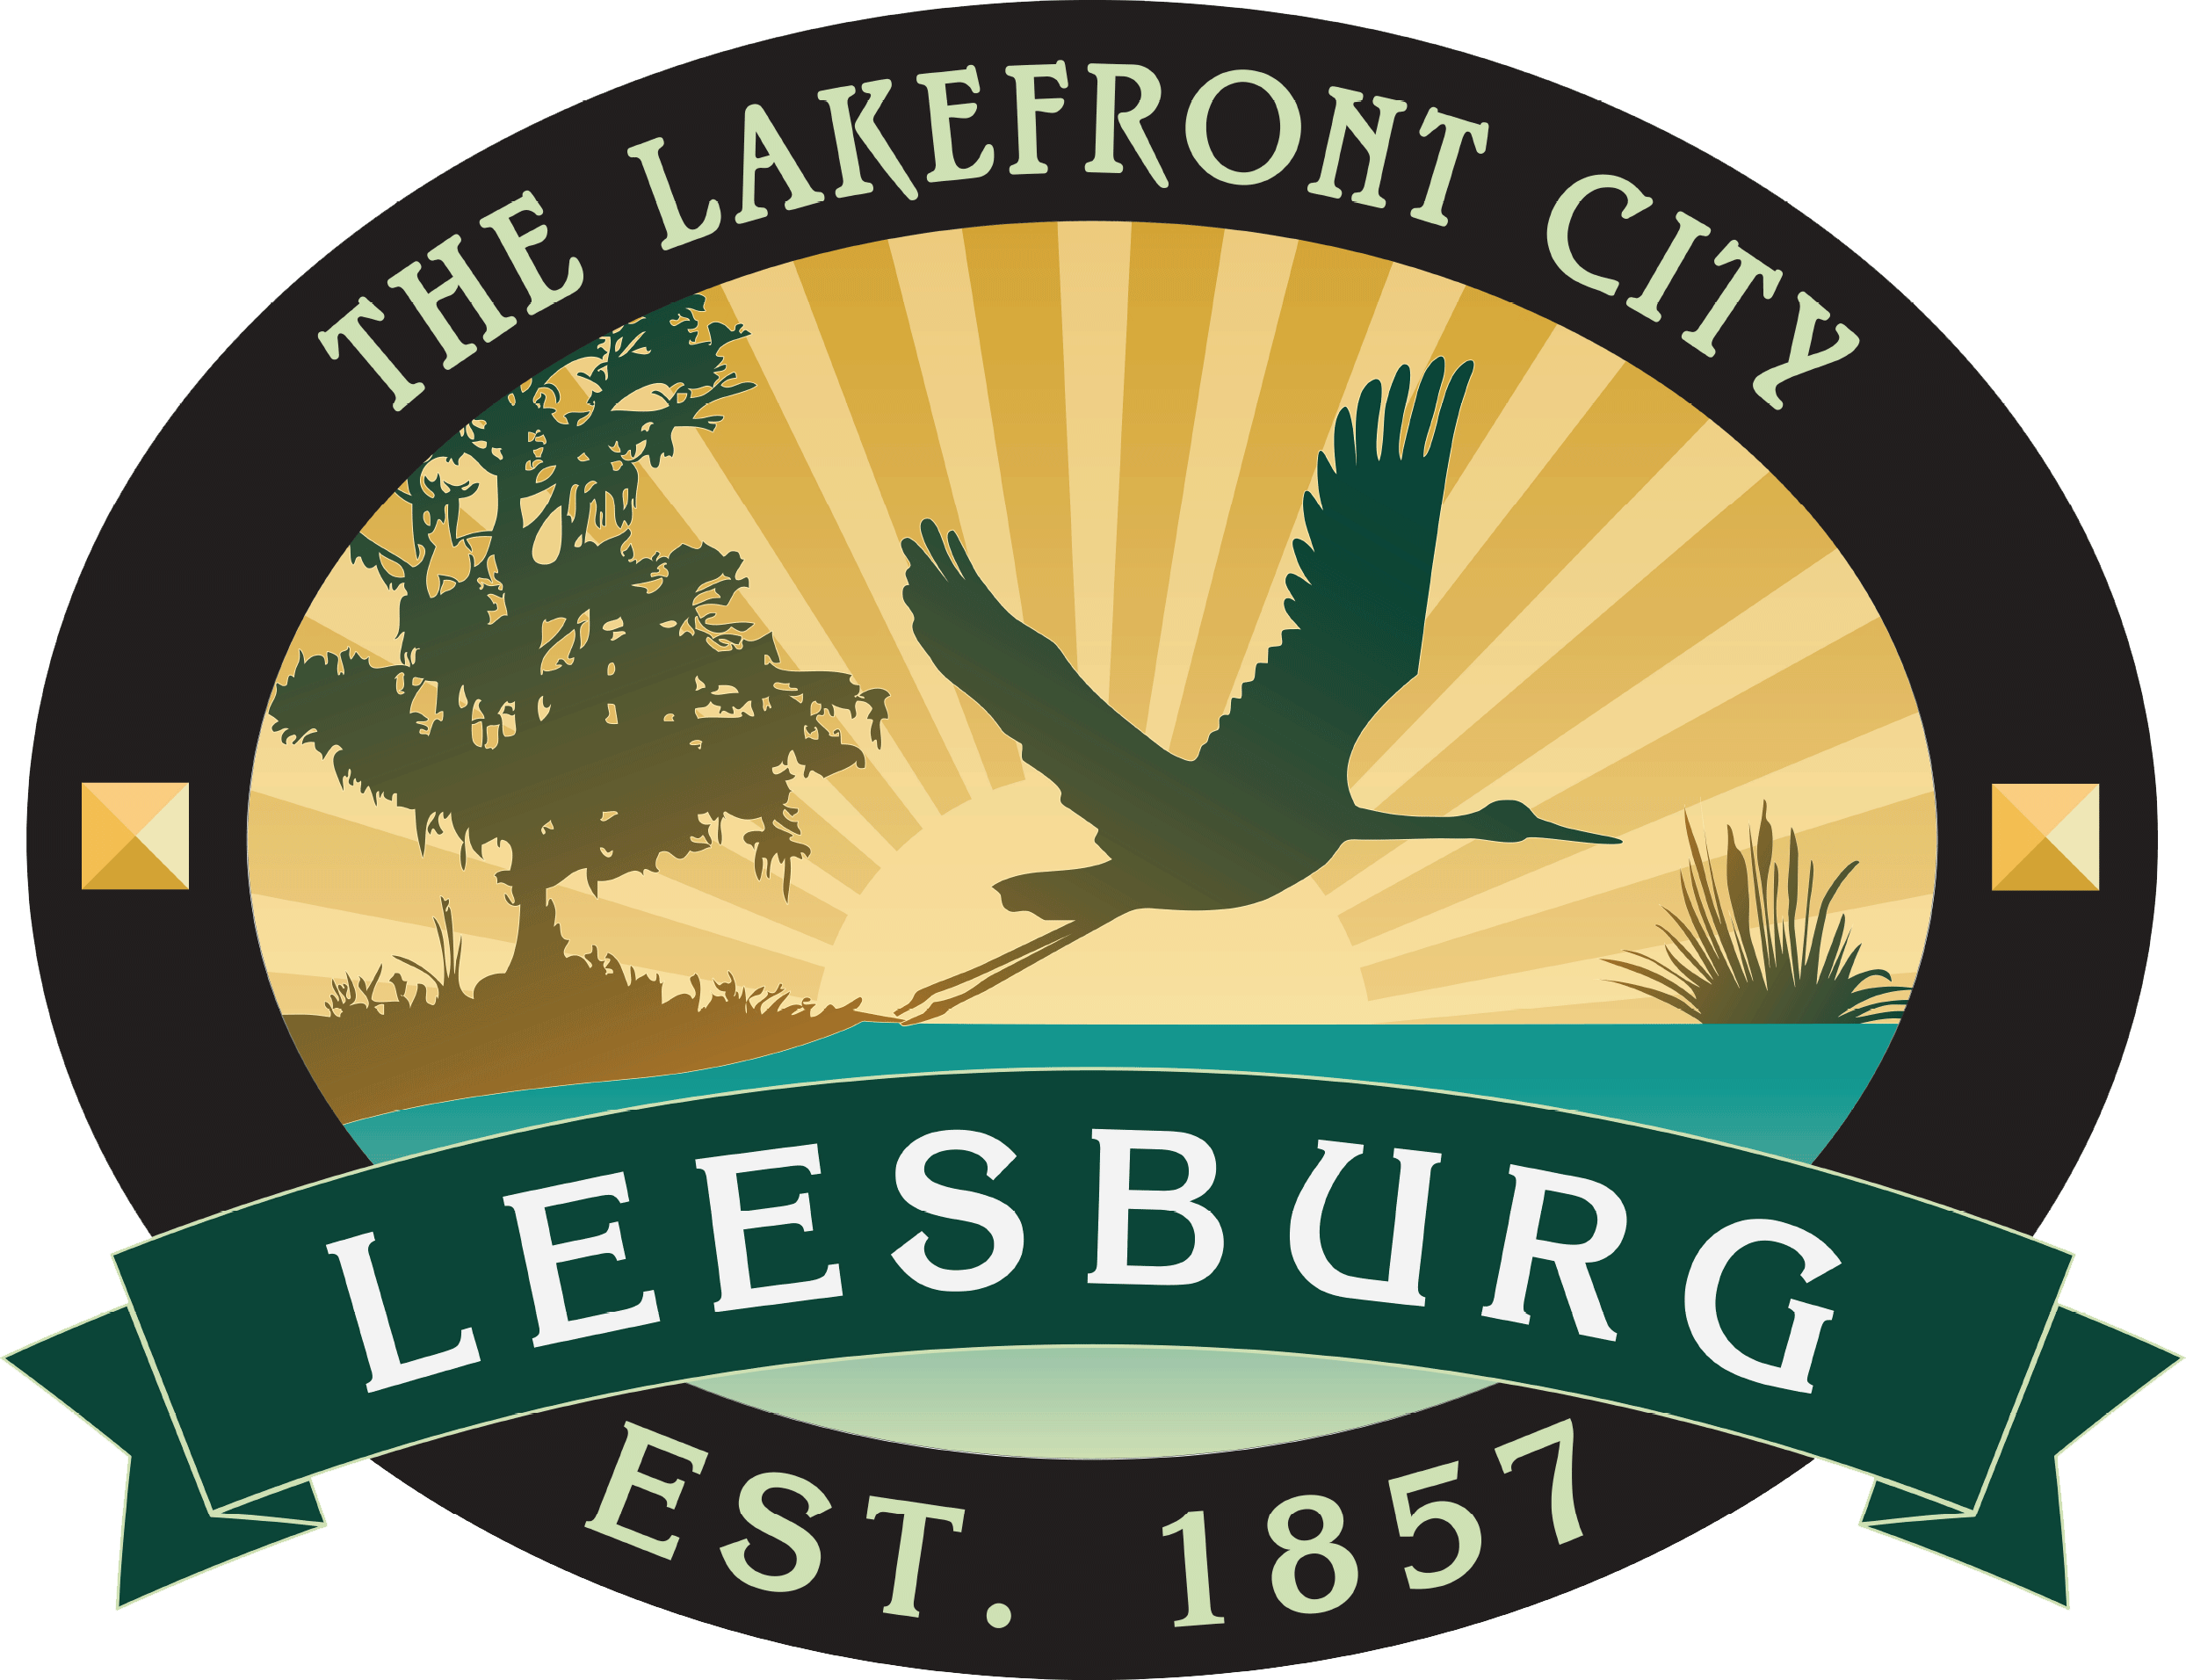 City of Leesburg Electric Department